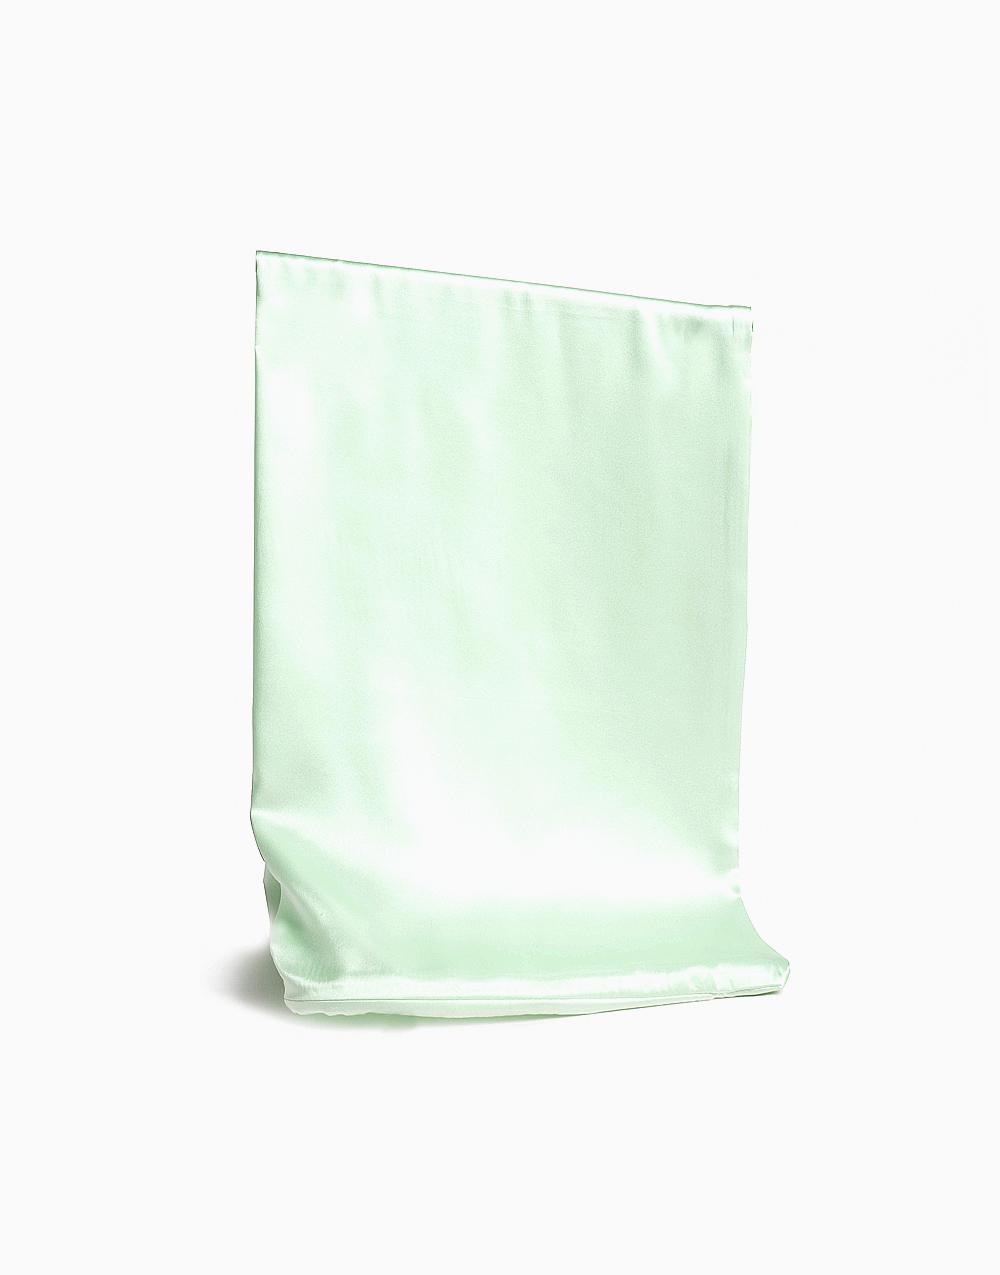 Anti-Wrinkle Silk Pillowcase by The Facialist | Light Green